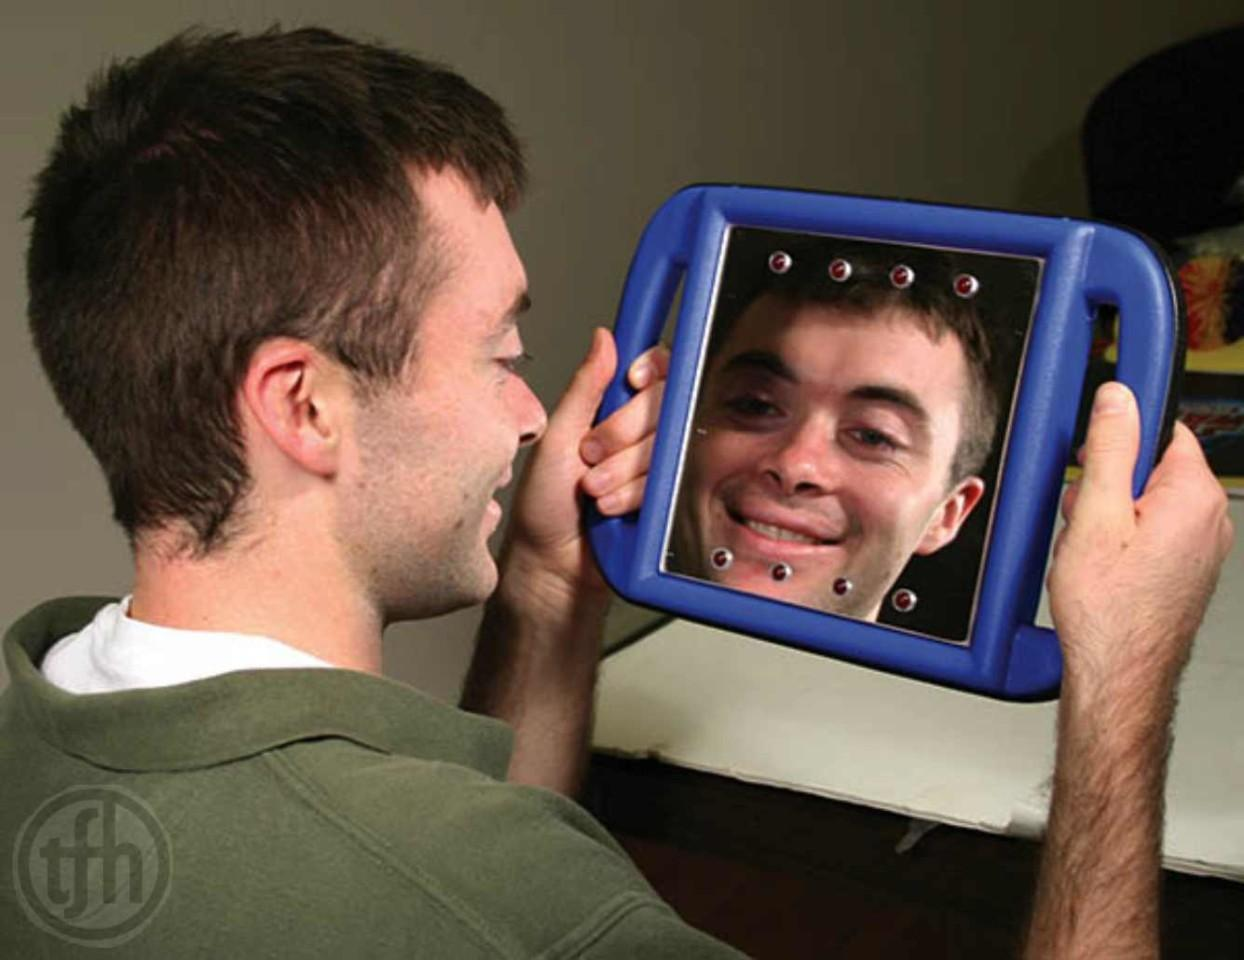 Light Up Vibrating Mirror